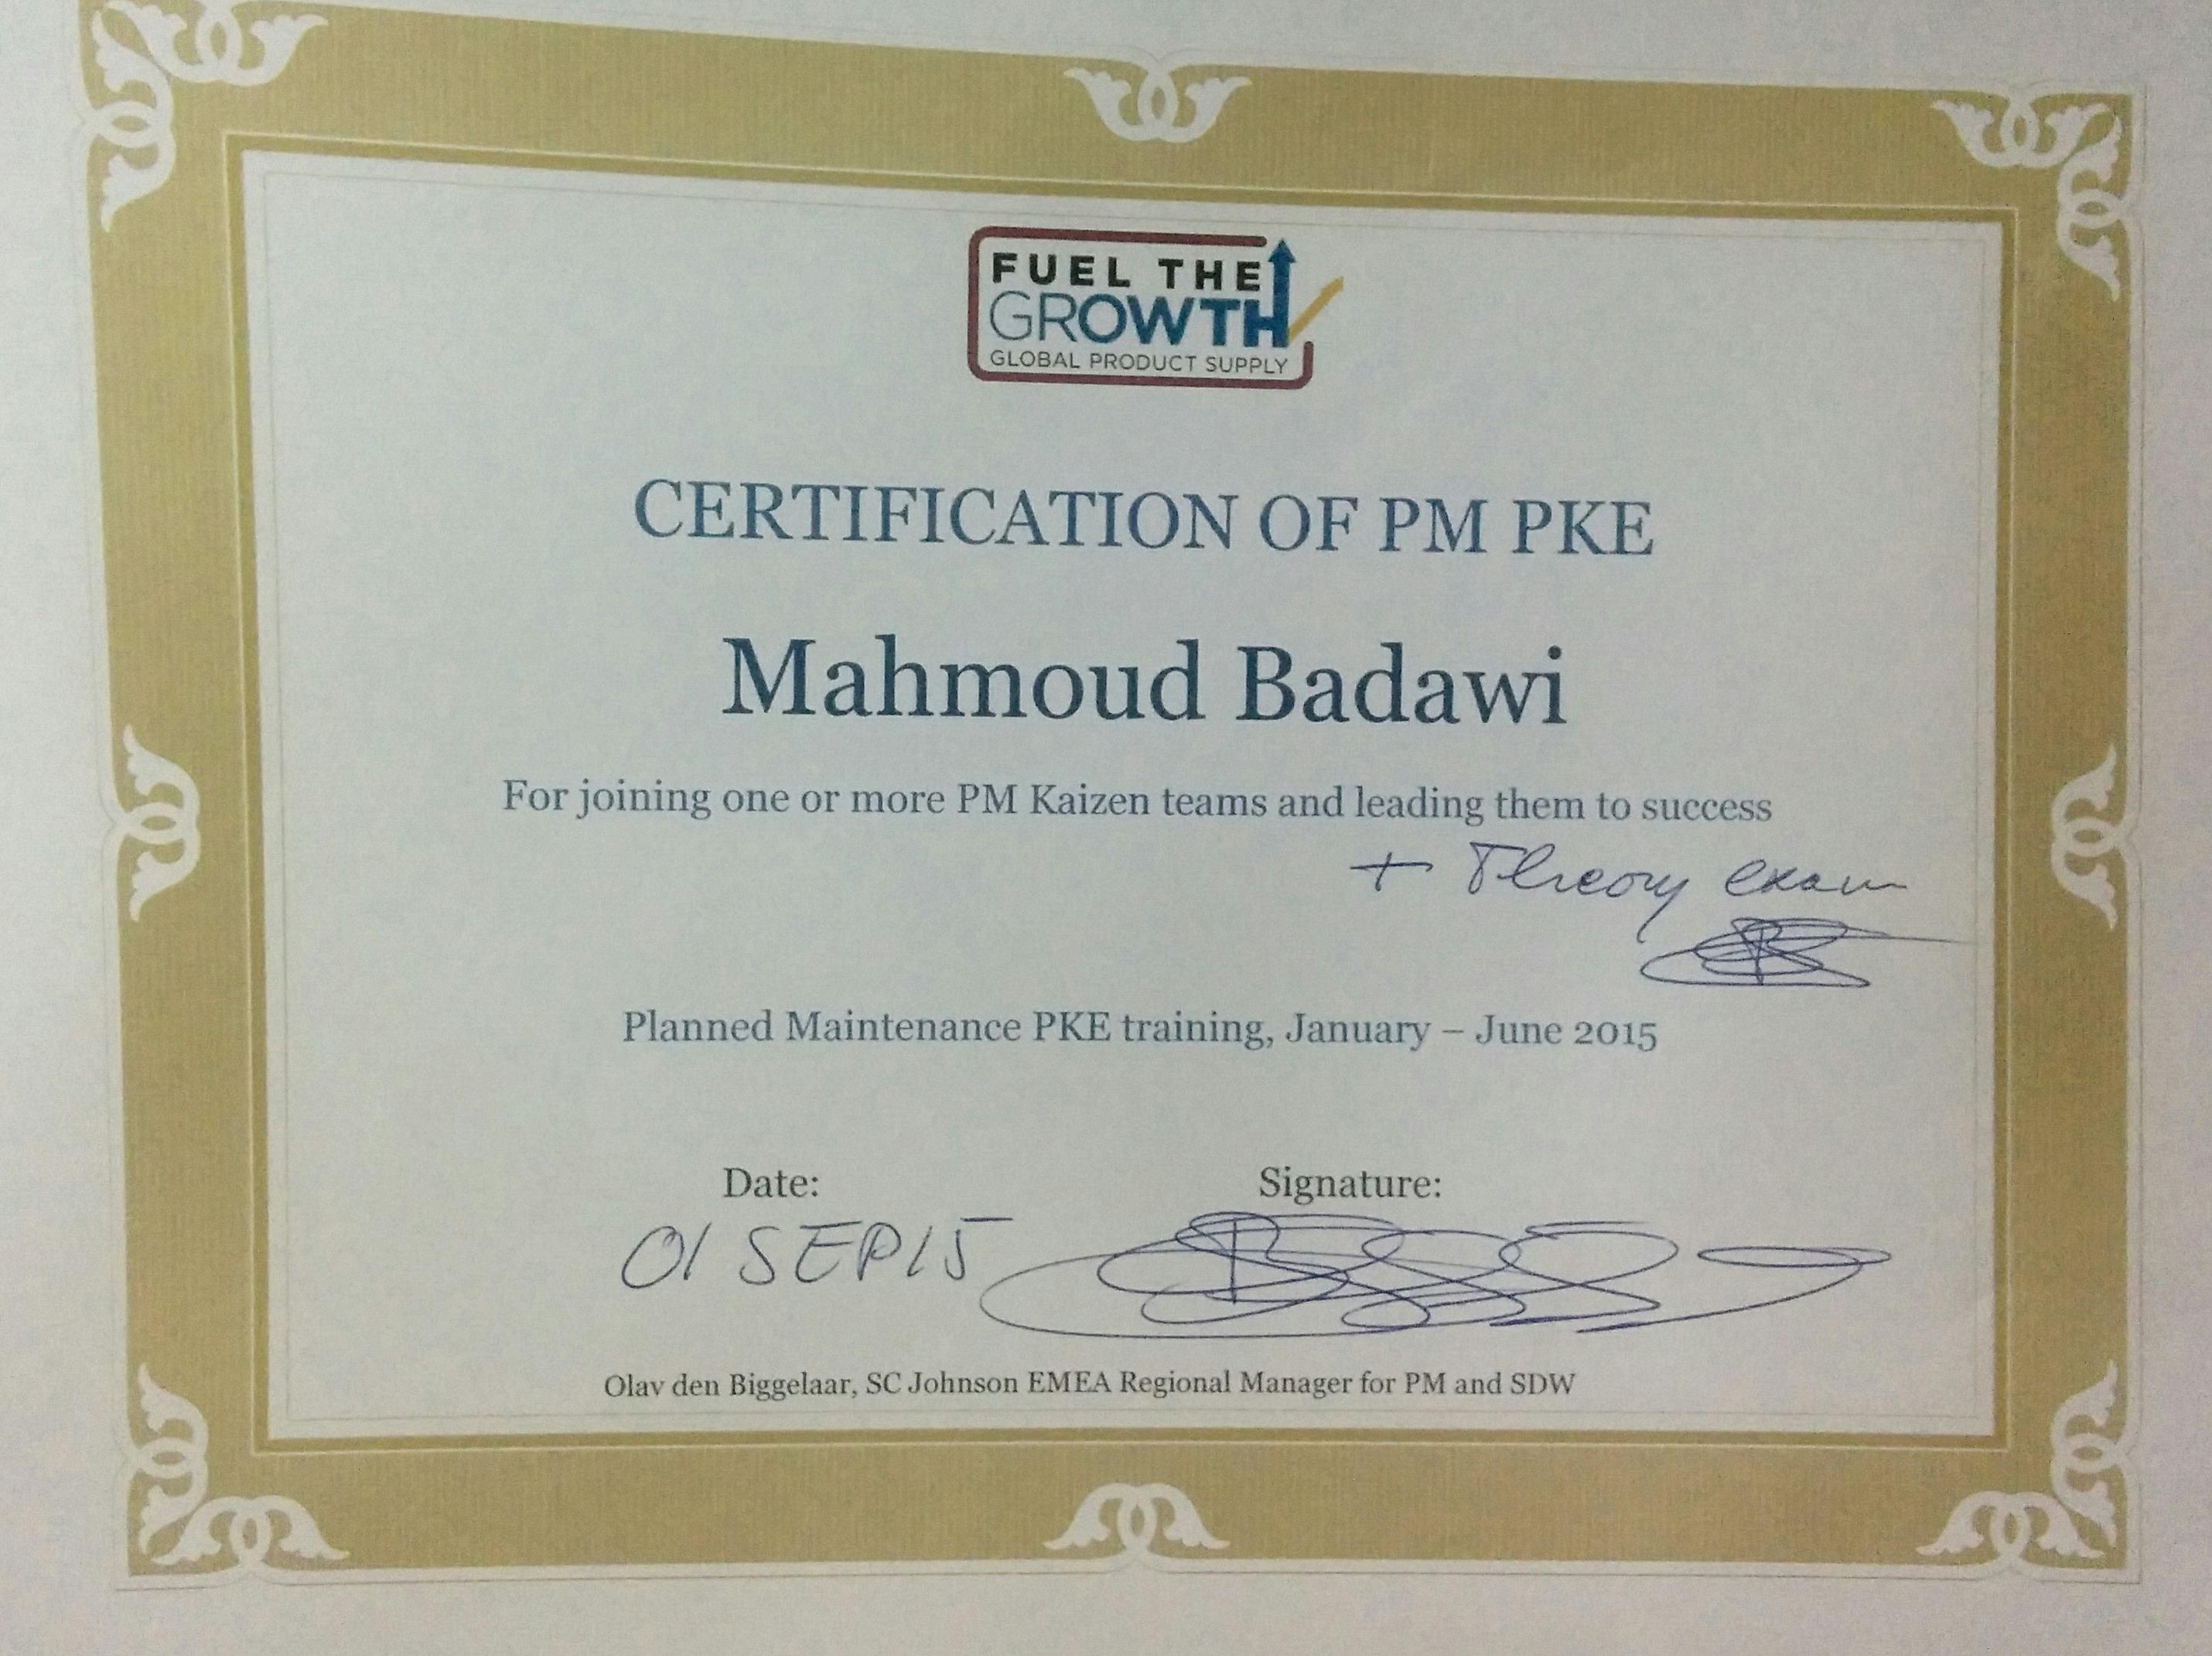 Mahmoud badawi bayt planned maintenance pillar kaizen engineer certificate 1betcityfo Gallery